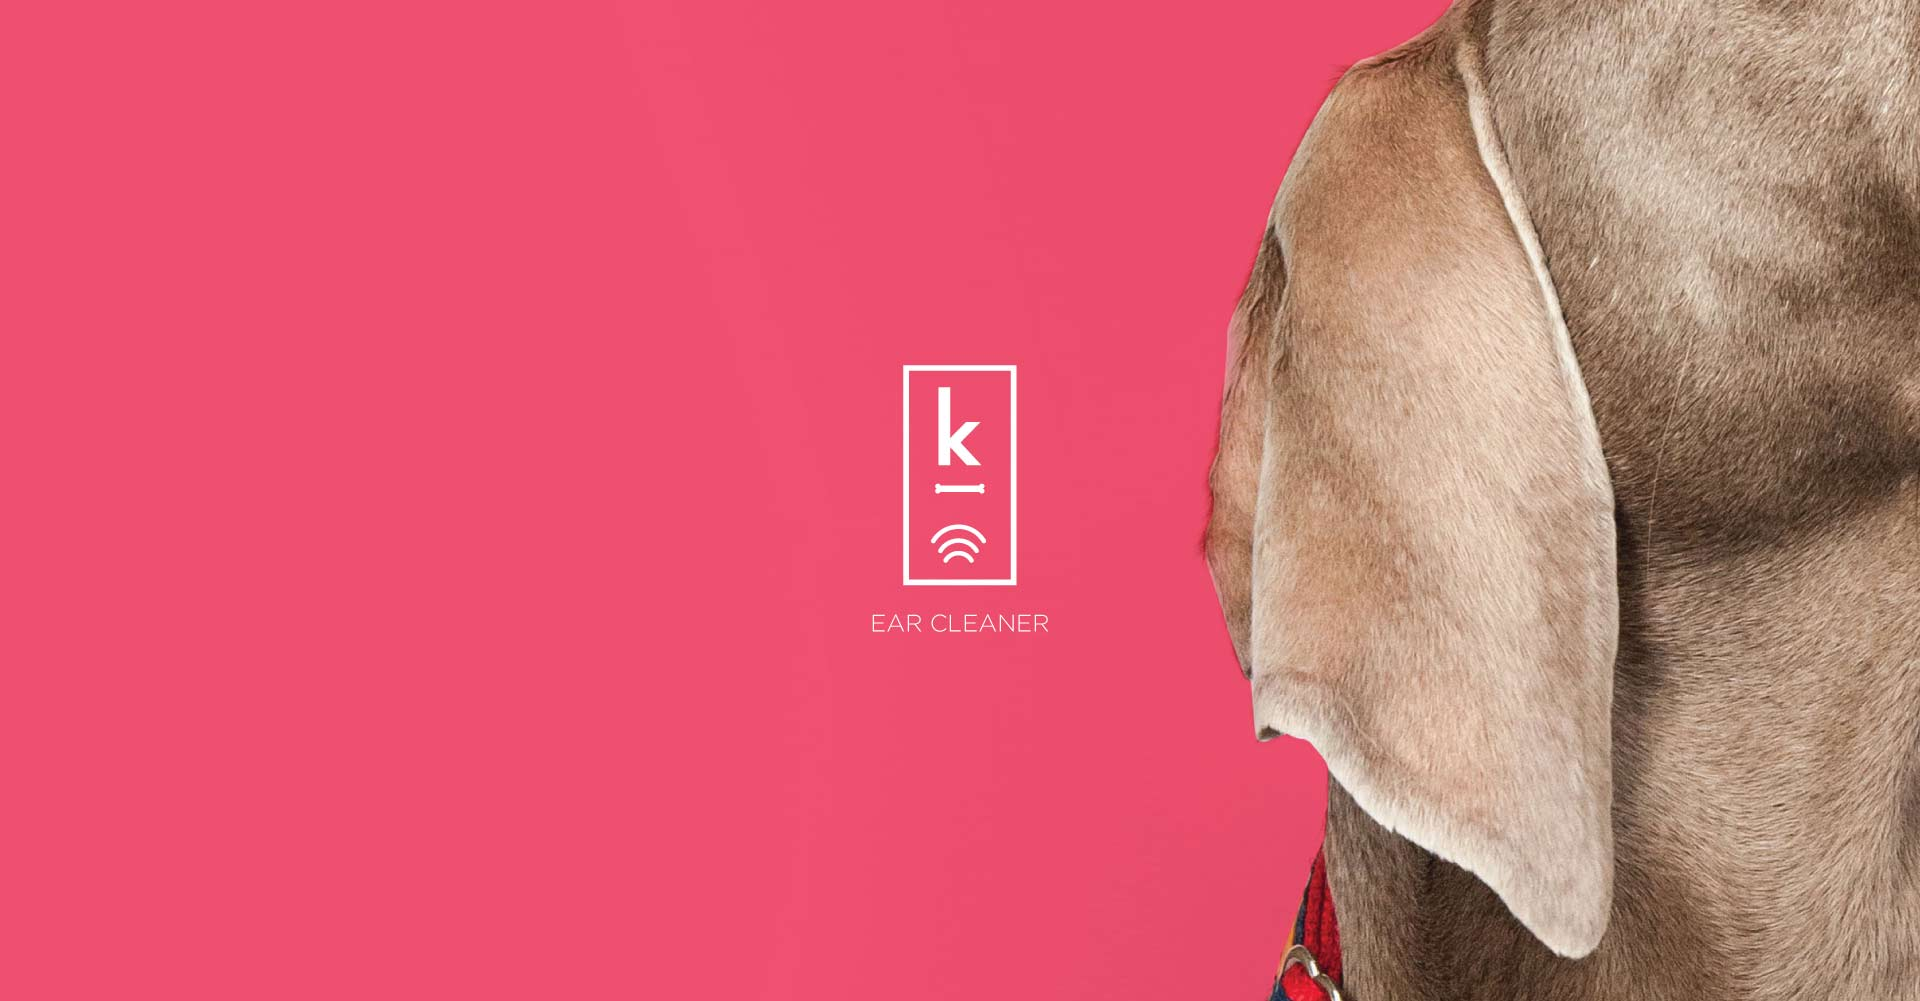 Creative_Retail_Packaging_Branding_Identity_Design_Klementime_11.jpg